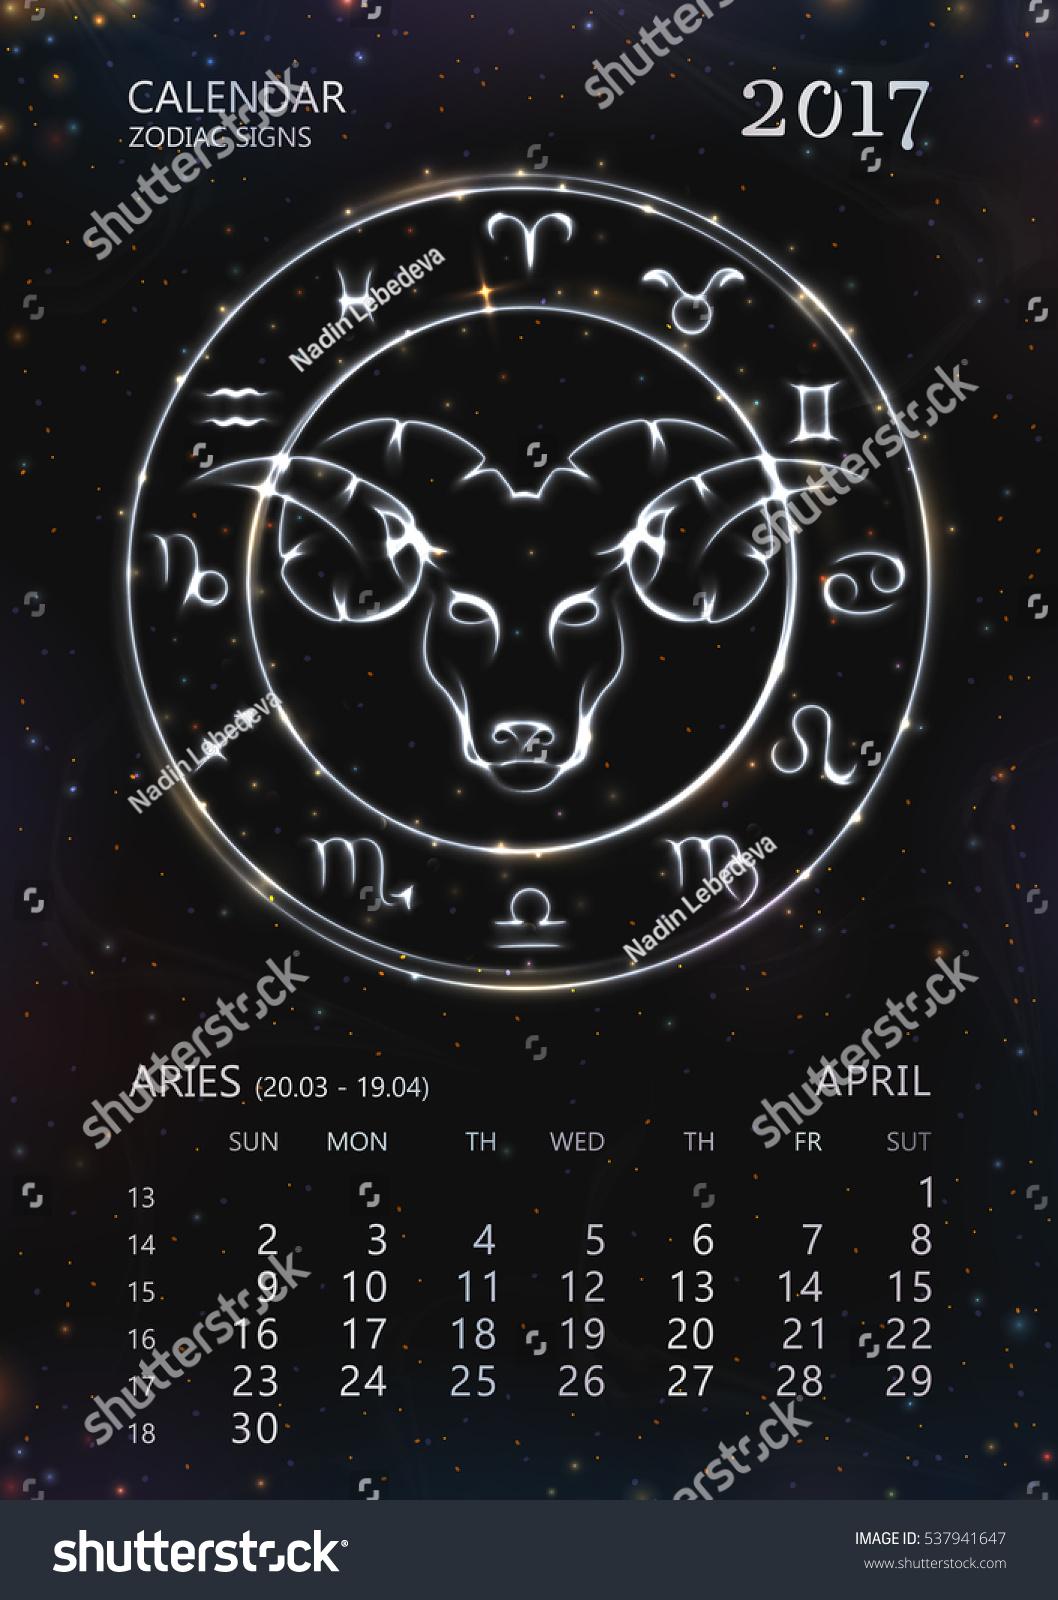 vector eps 10 silver glowing calendar stock vector 537941647 shutterstock. Black Bedroom Furniture Sets. Home Design Ideas